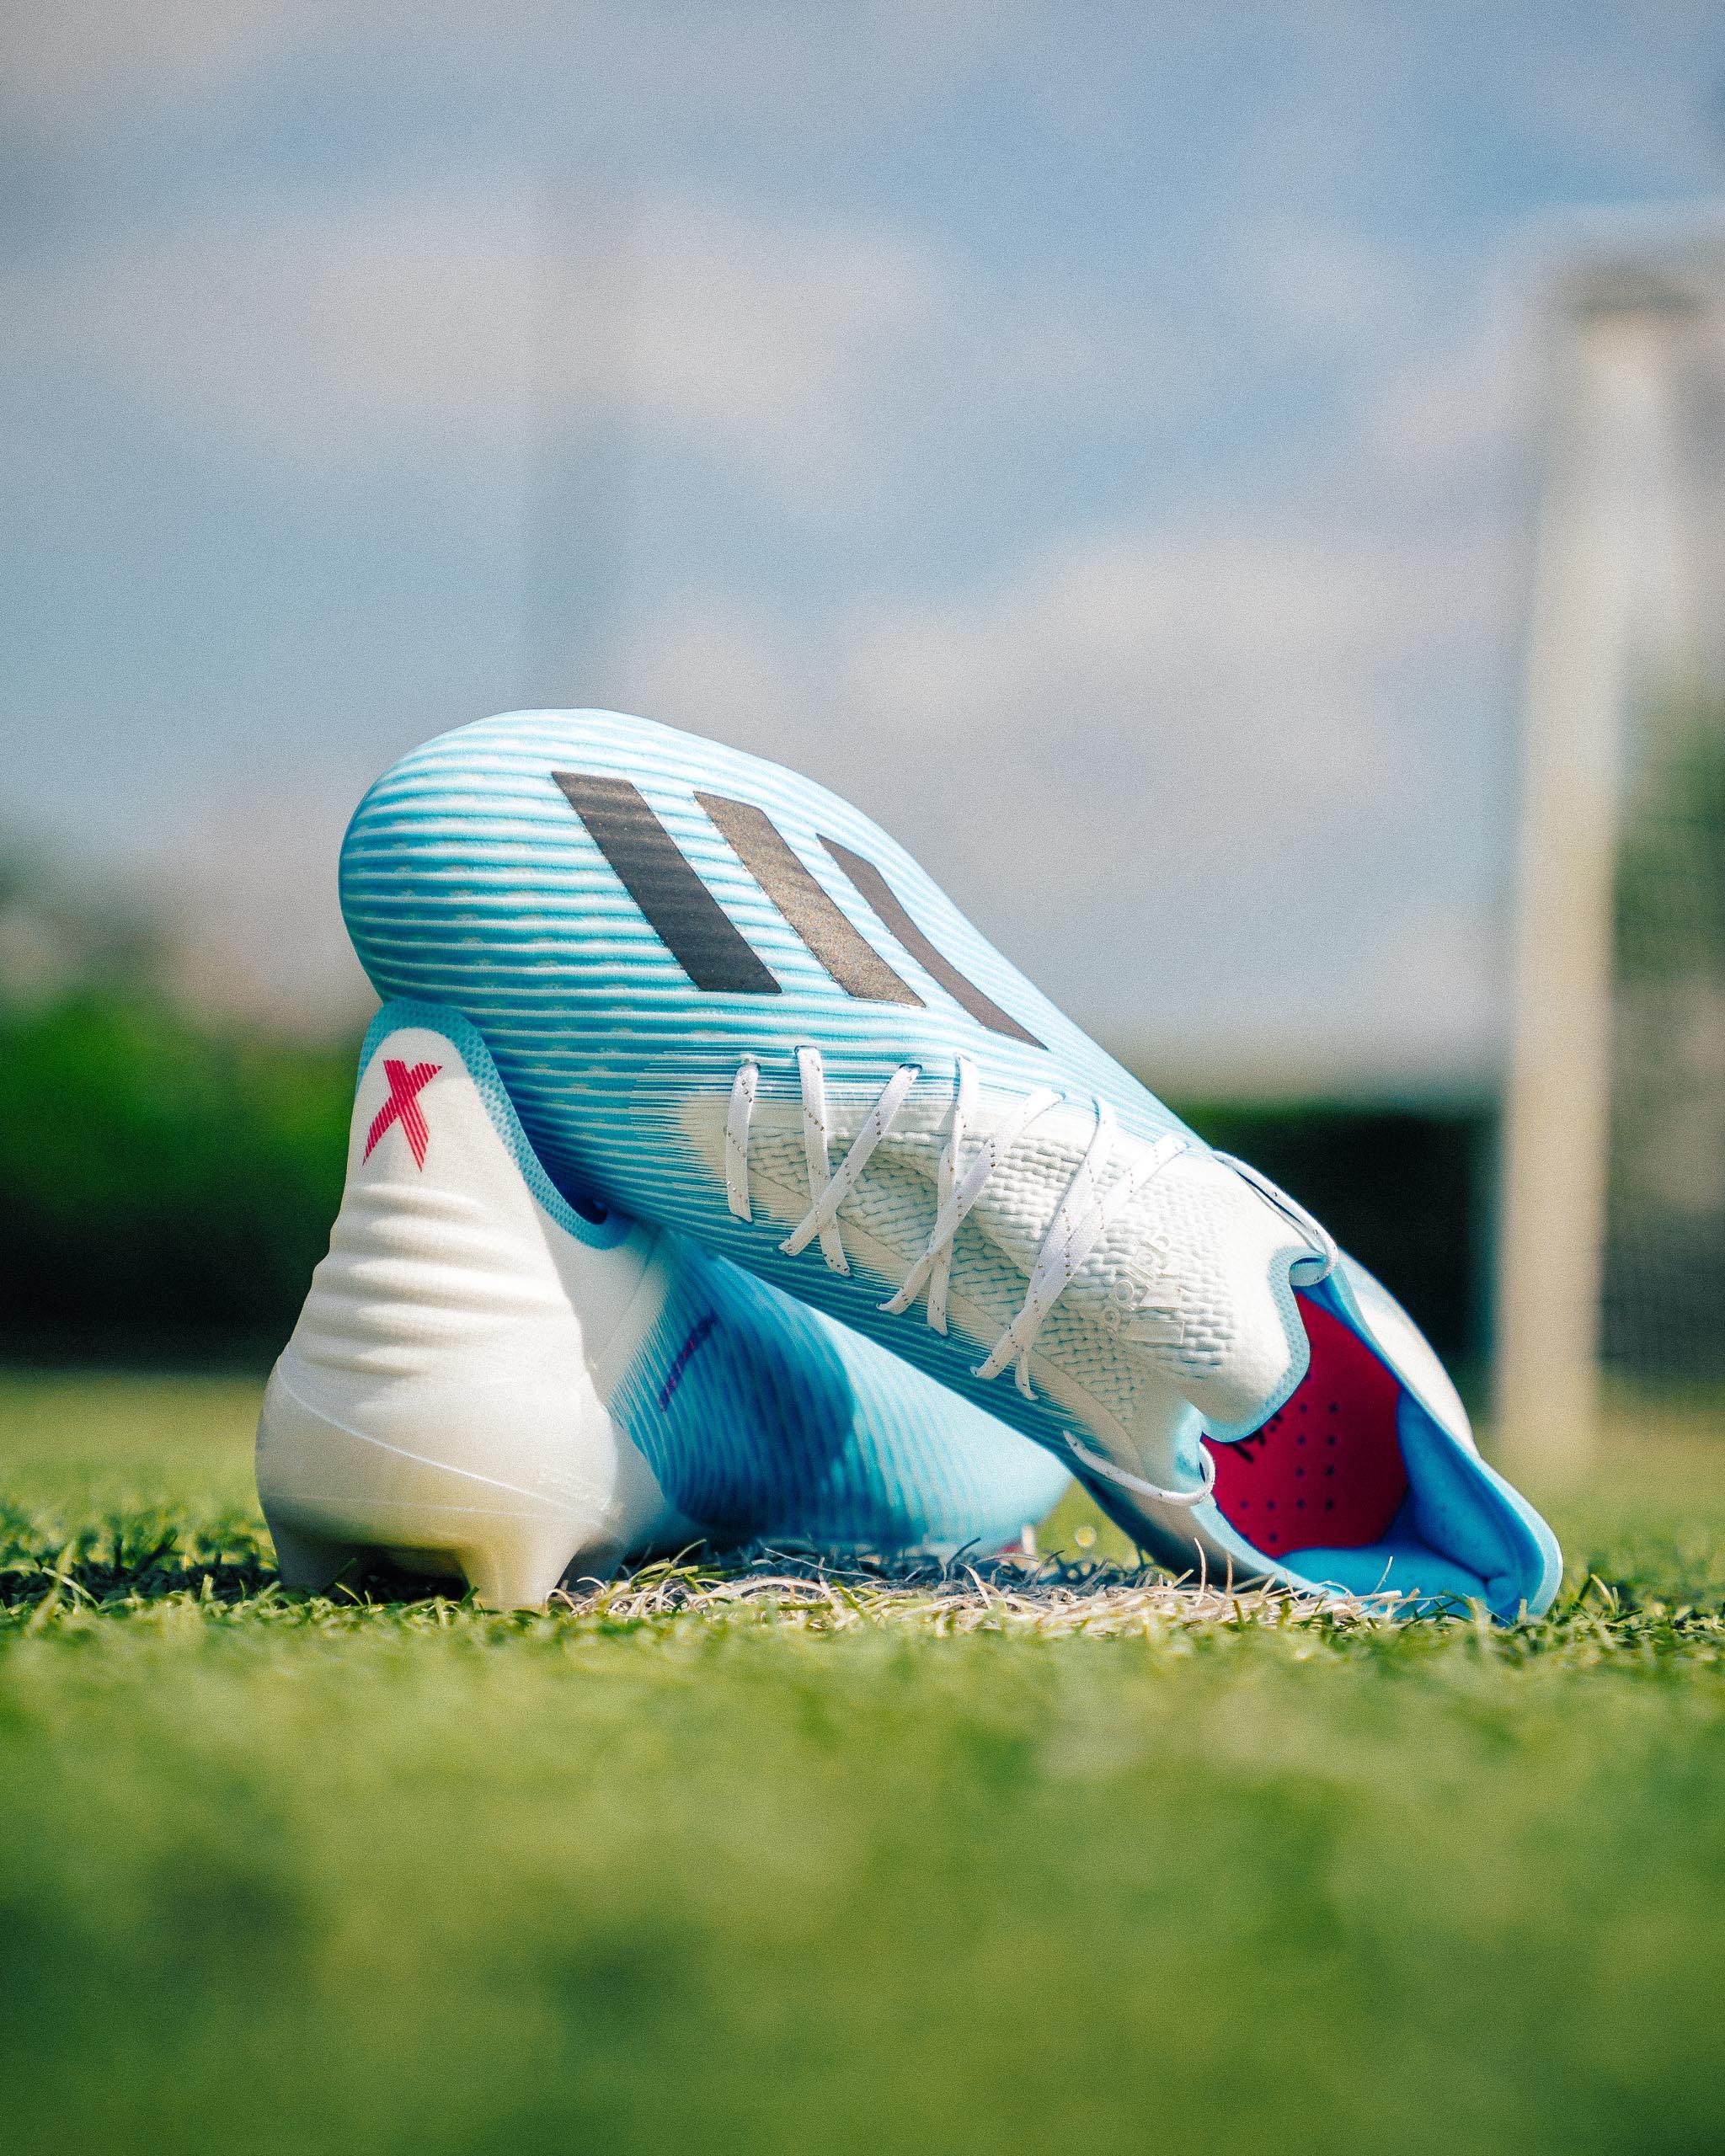 dirección almacenamiento Bastante  adidas Football Launches the Hard Wired Pack   Goal.com